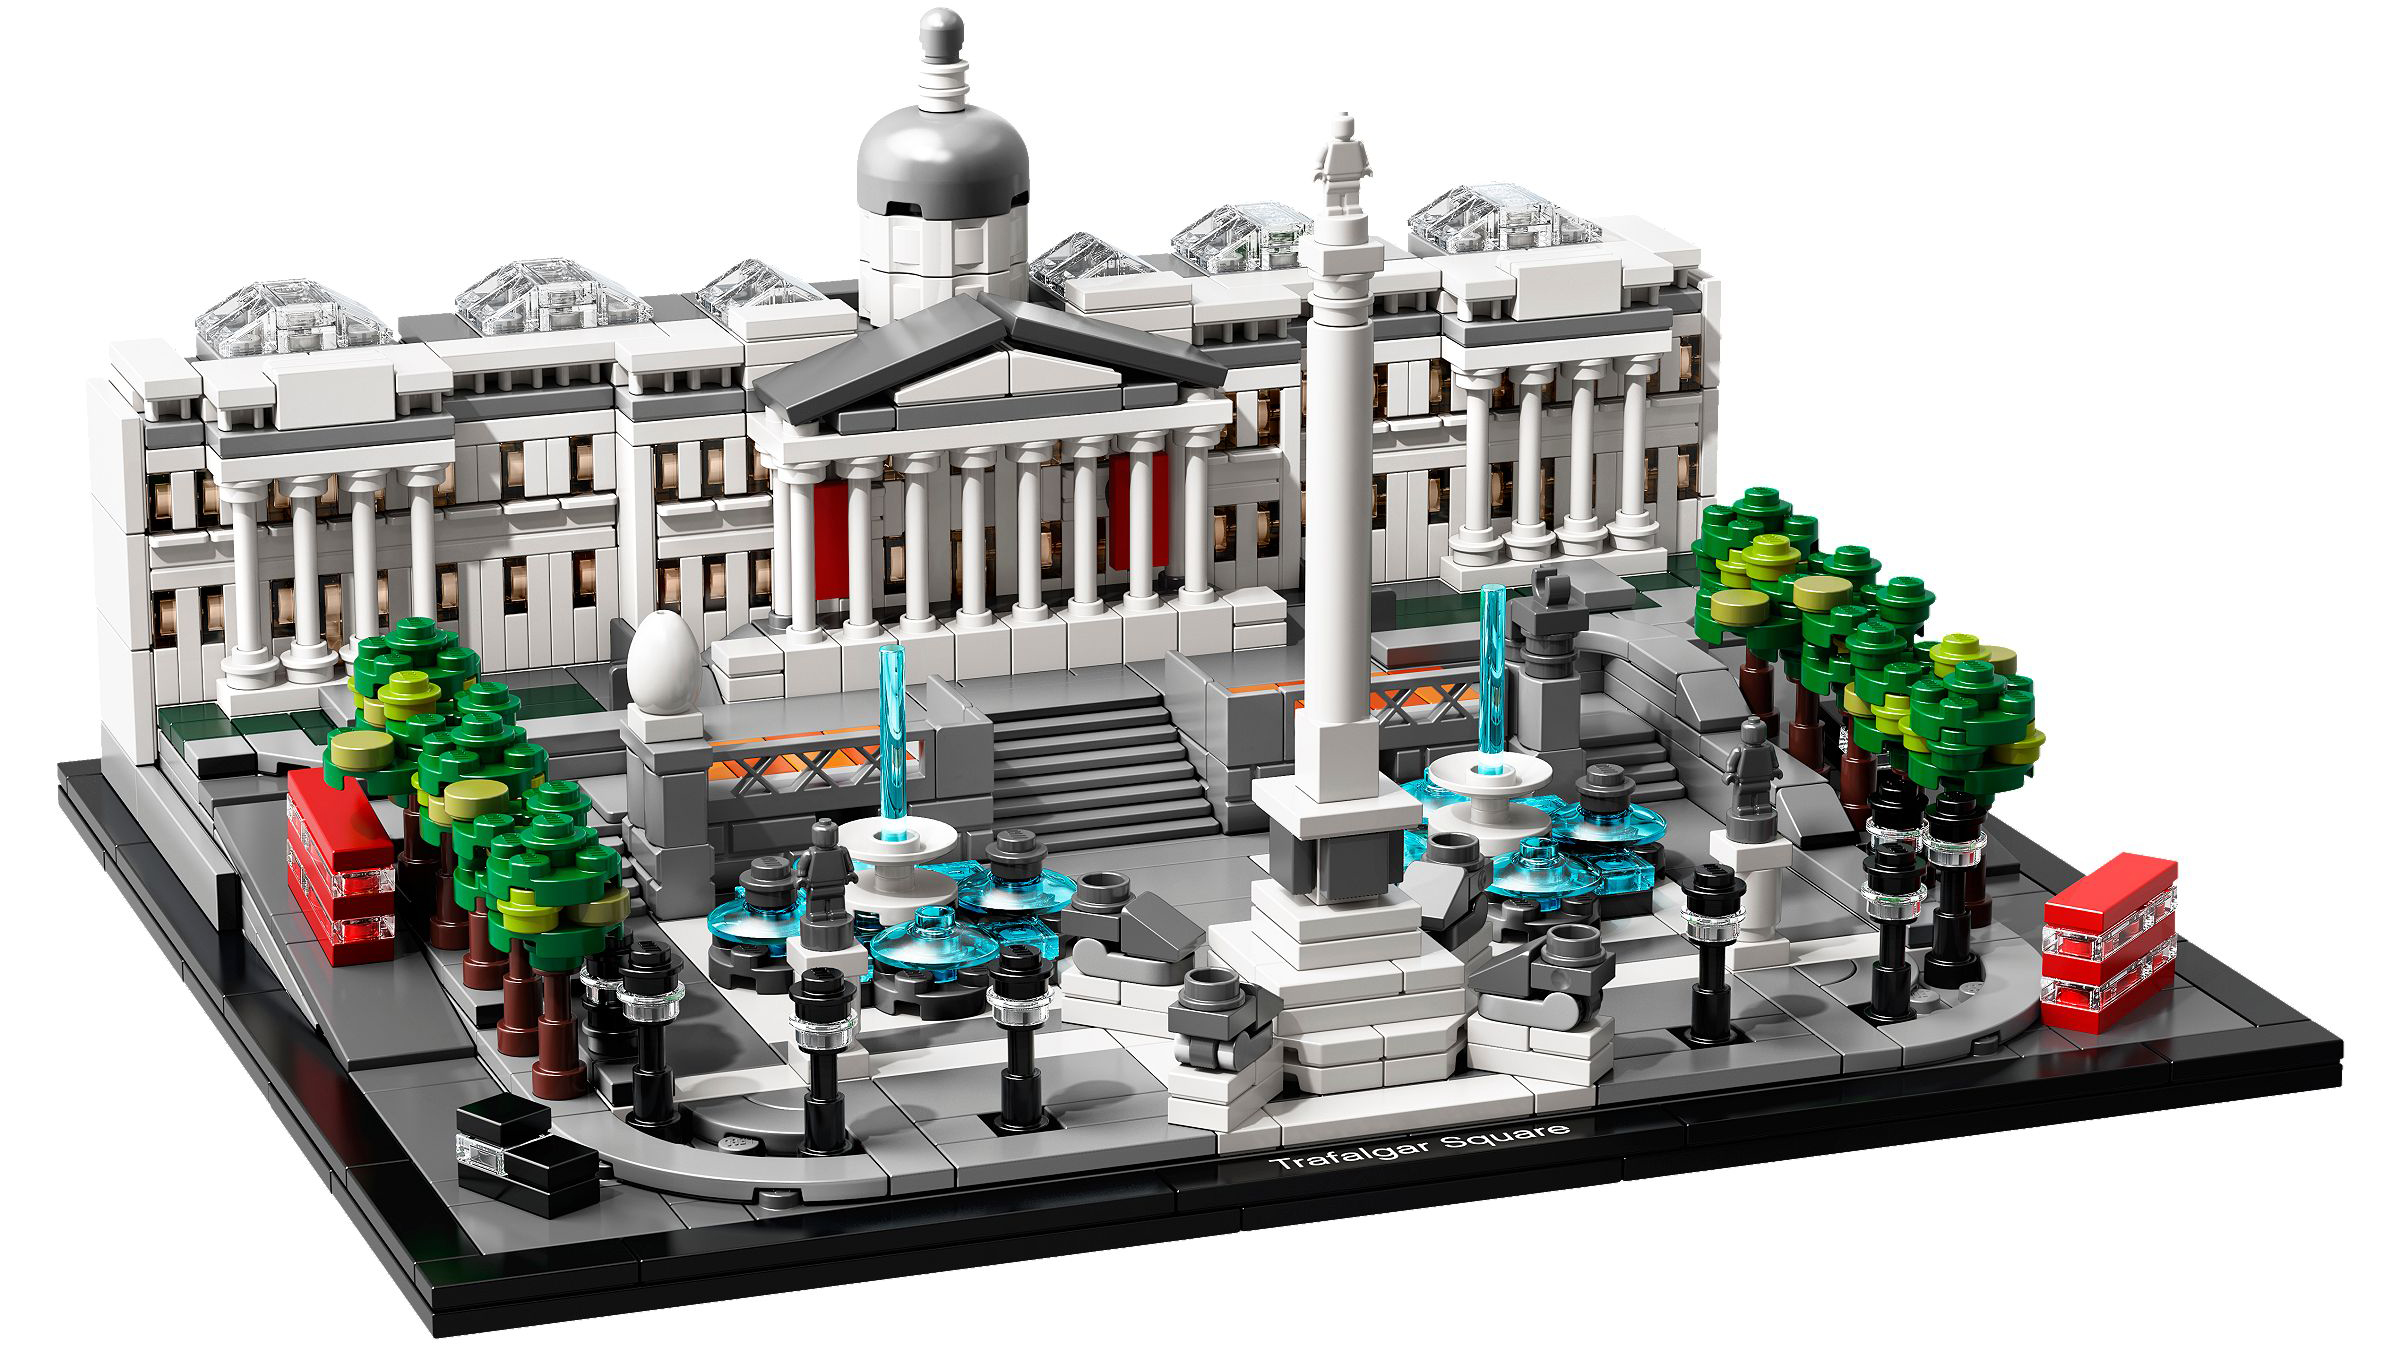 Best Lego Architecture sets: Trafalgar Square